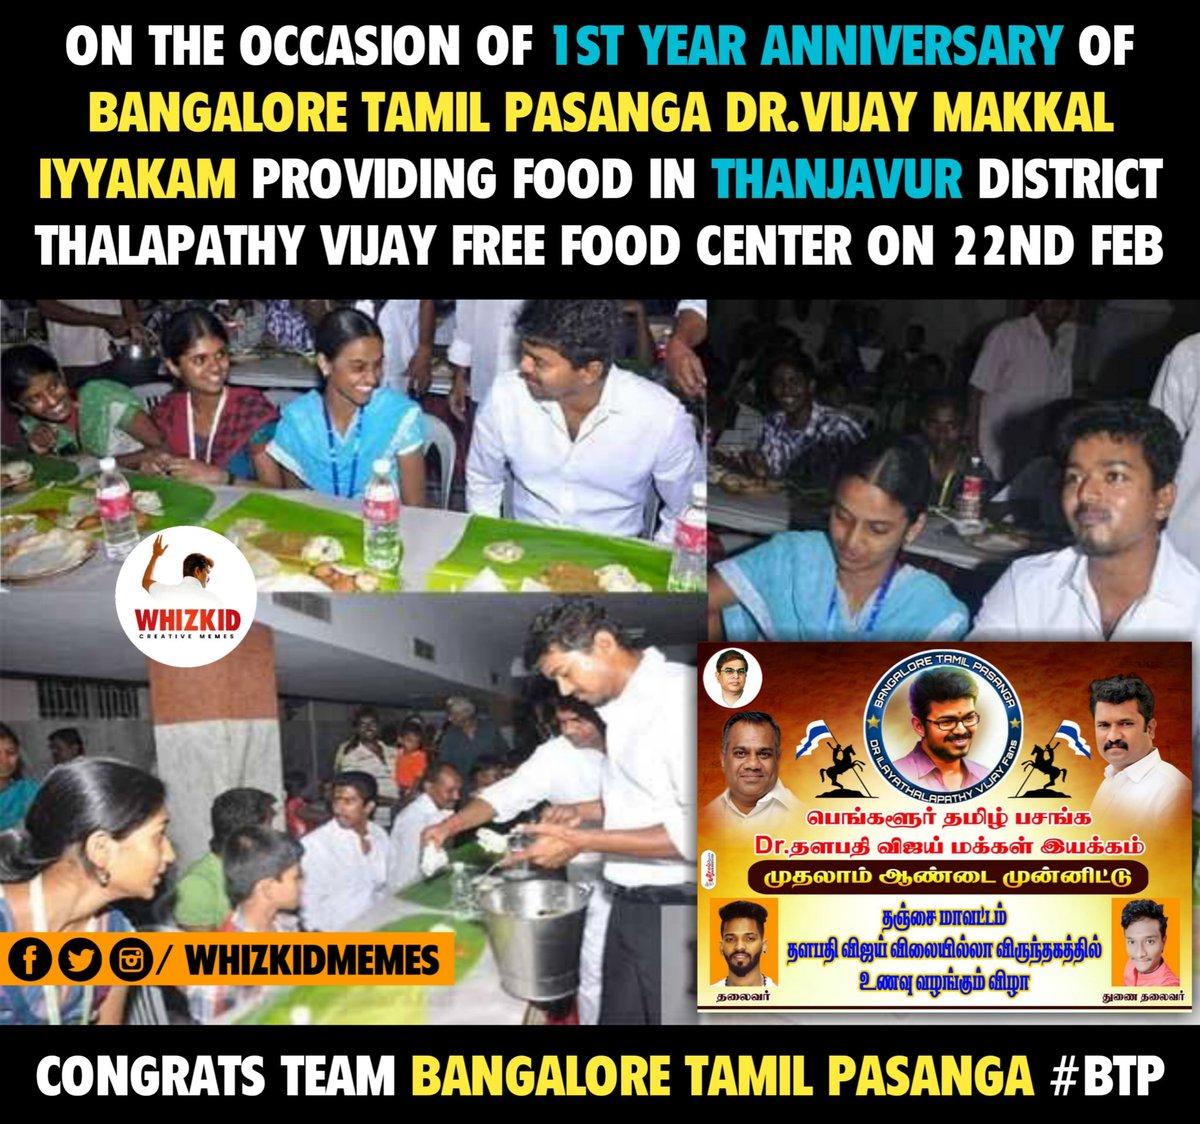 On the occasion of 1st year anniversary of Bangalore Tamil Pasanga Dr.Vijay Makkal Iyyakam providing food in Thanjavur district Thalapathy Vijay Free food center on 22nd February !  Congrats Team Bangalore Tamil Pasanga (@BTP_Offl )  #Master #1YRoFBTPVMI  @TNJ_VMI @m_gajan